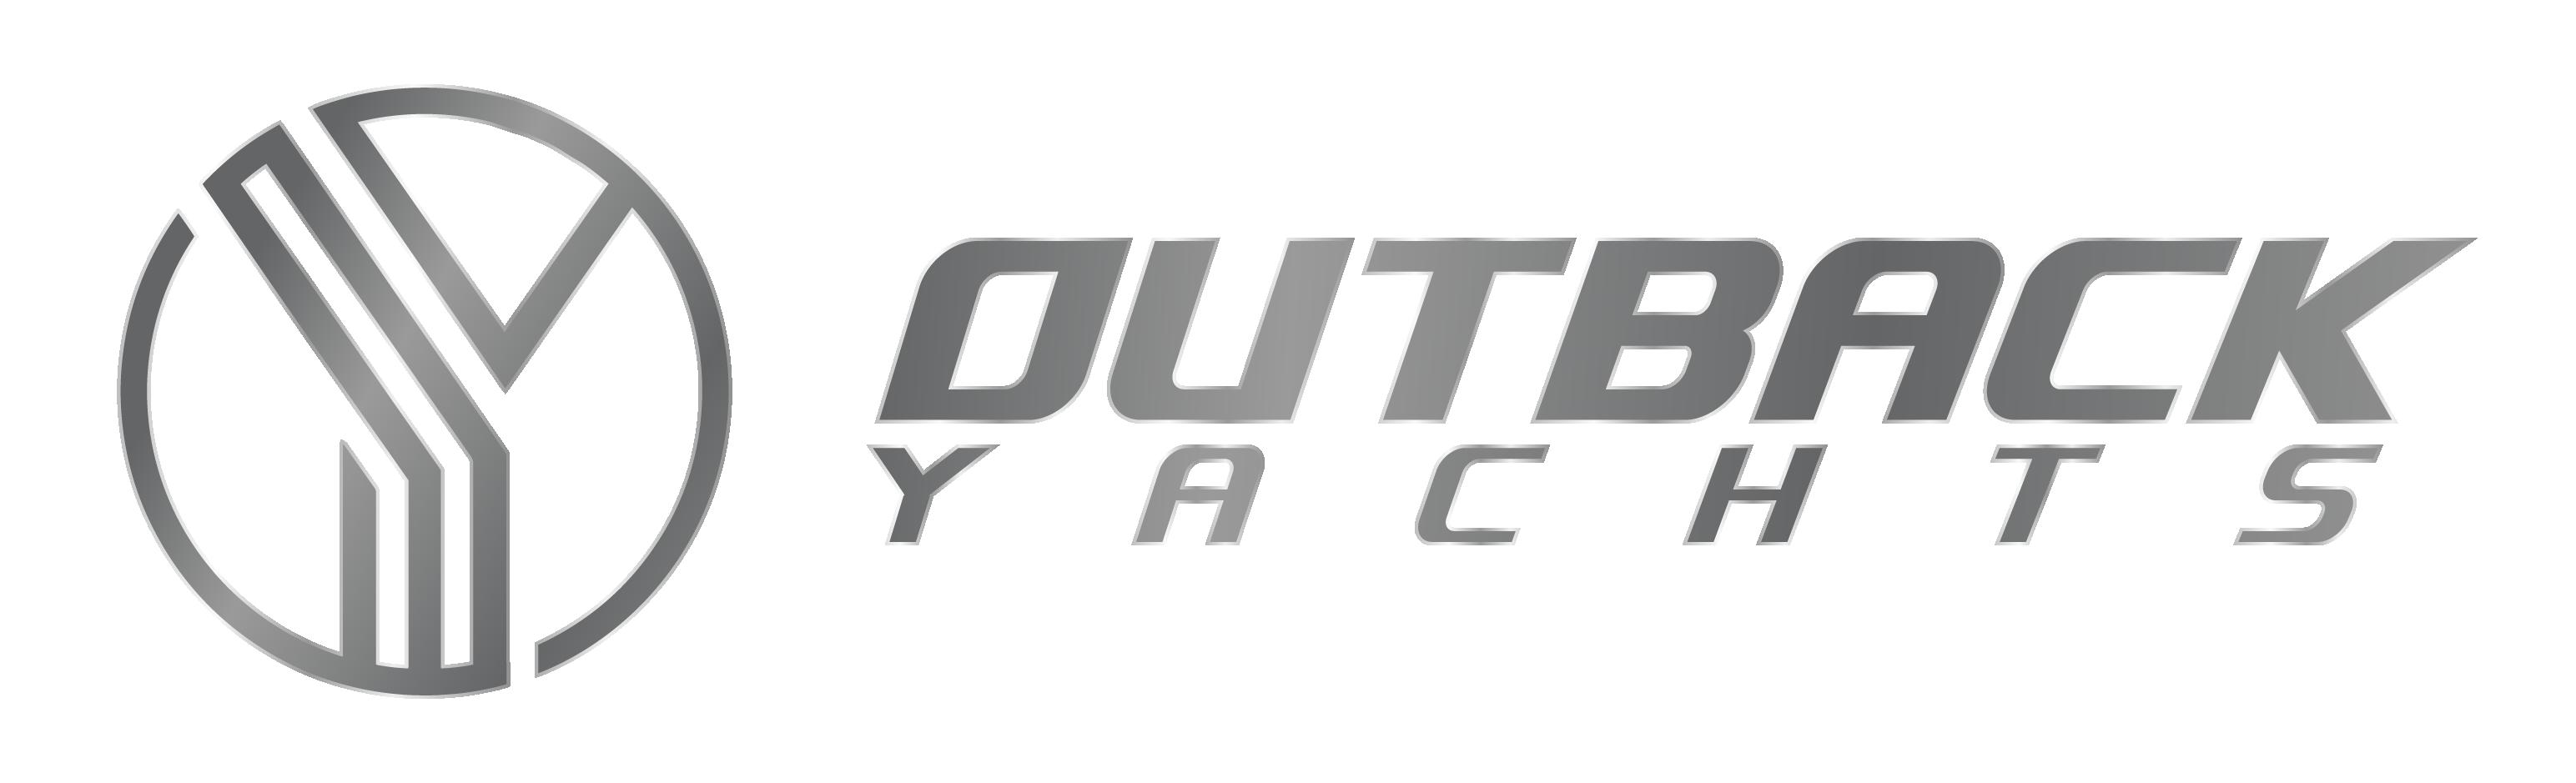 Outback Yachts logo